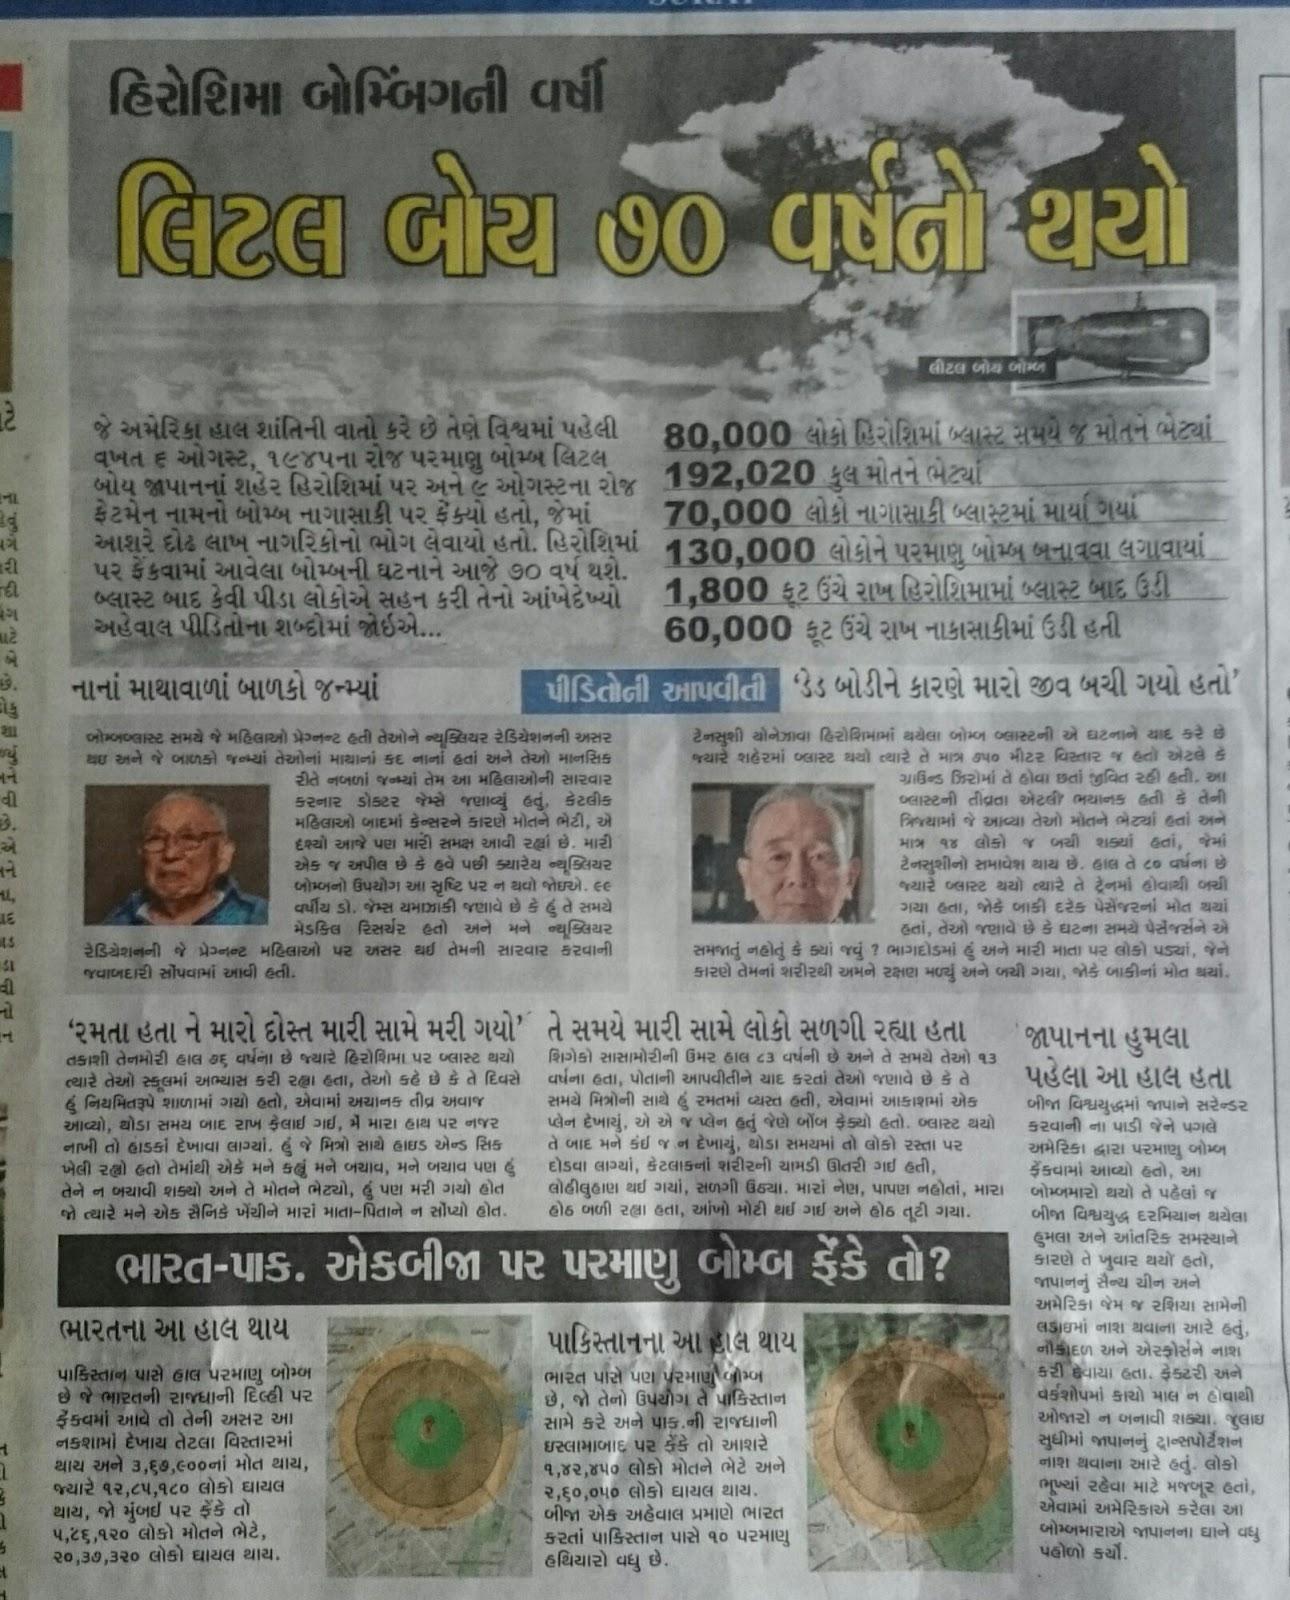 Nitin Pathak: hirosima nagasaki atom bomb